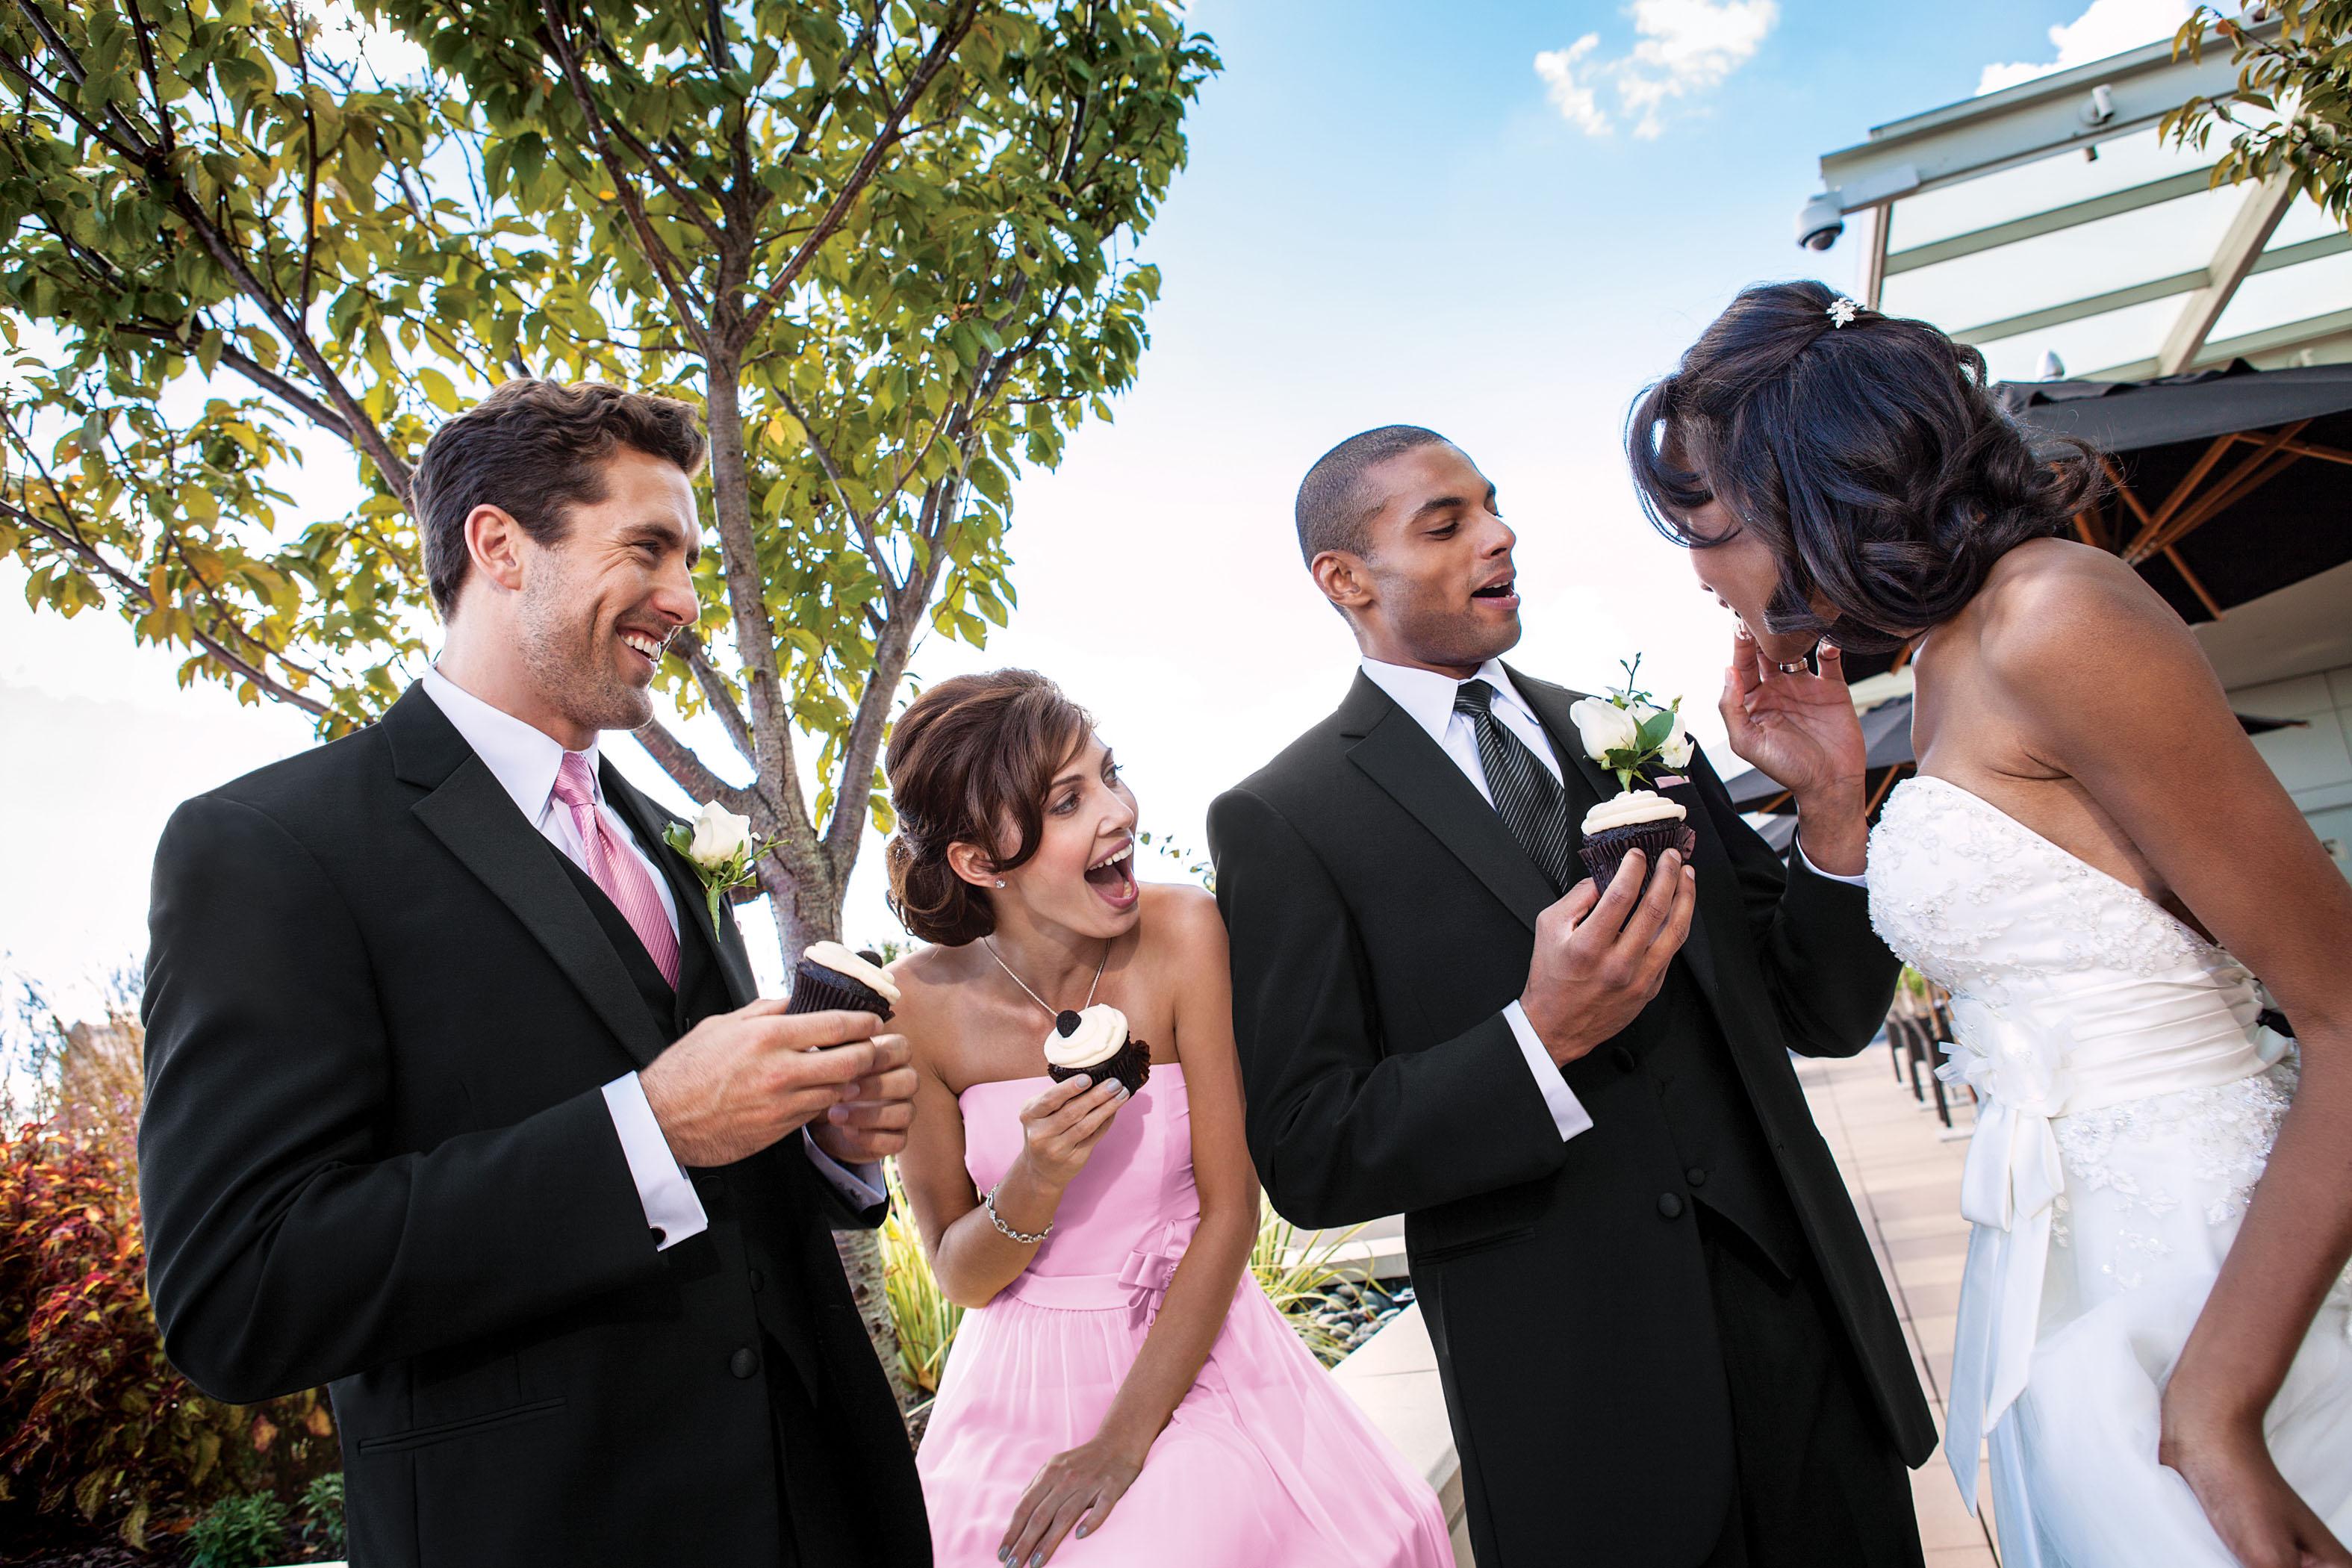 wedding party enjoying cupcakes on wedding day